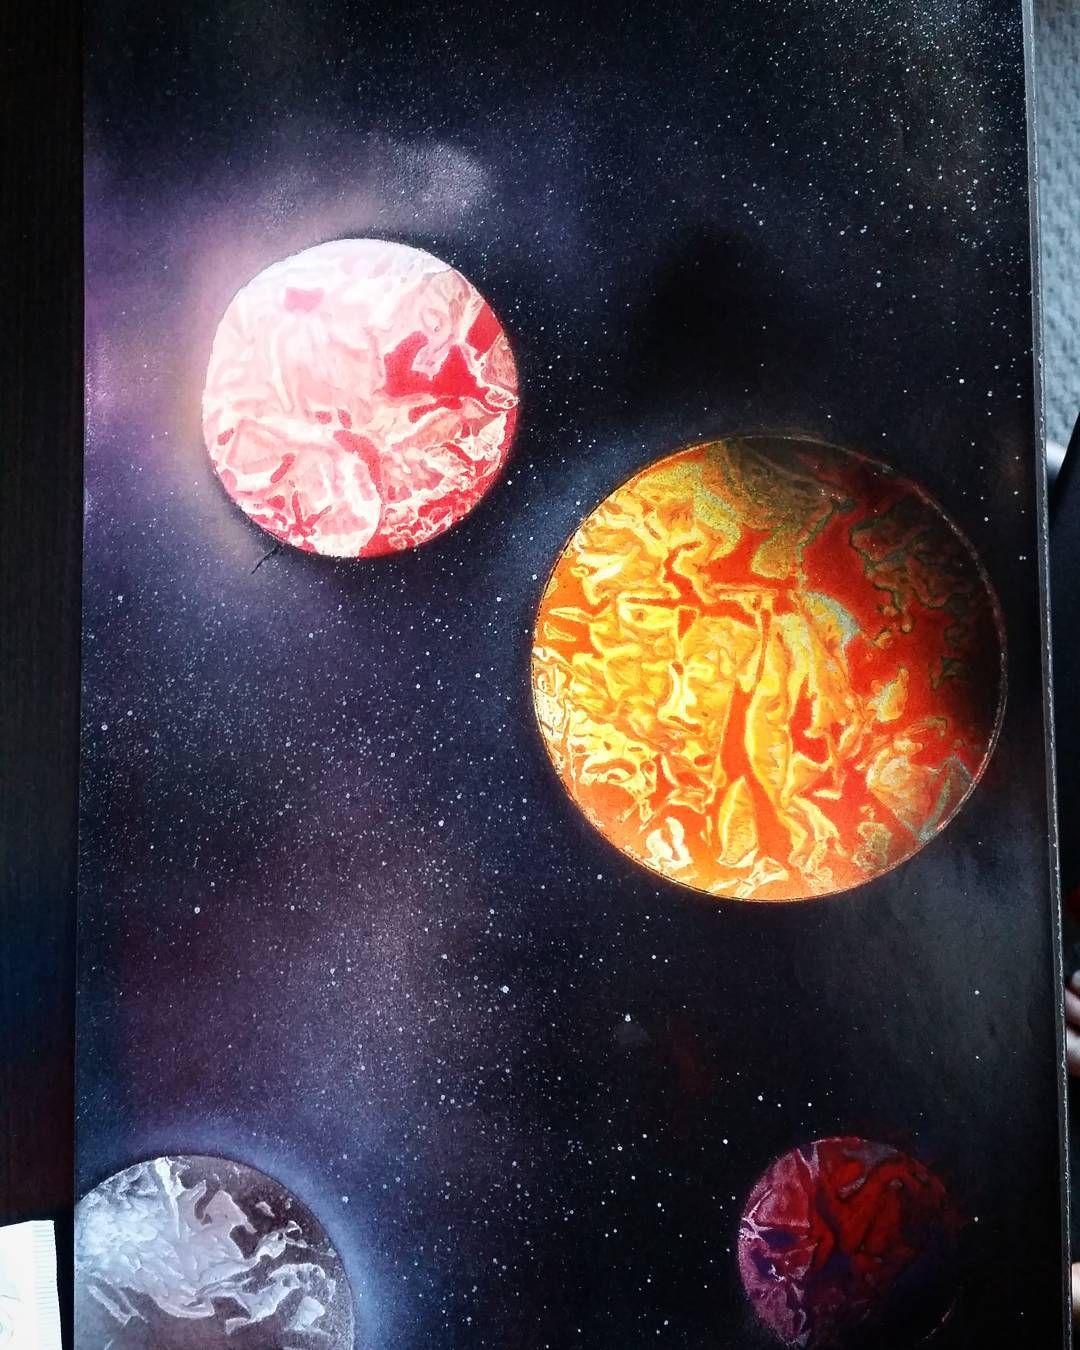 Gmail planets theme - Provocative Planet Pics Please Tumblr Com Spray Paint Art I Did